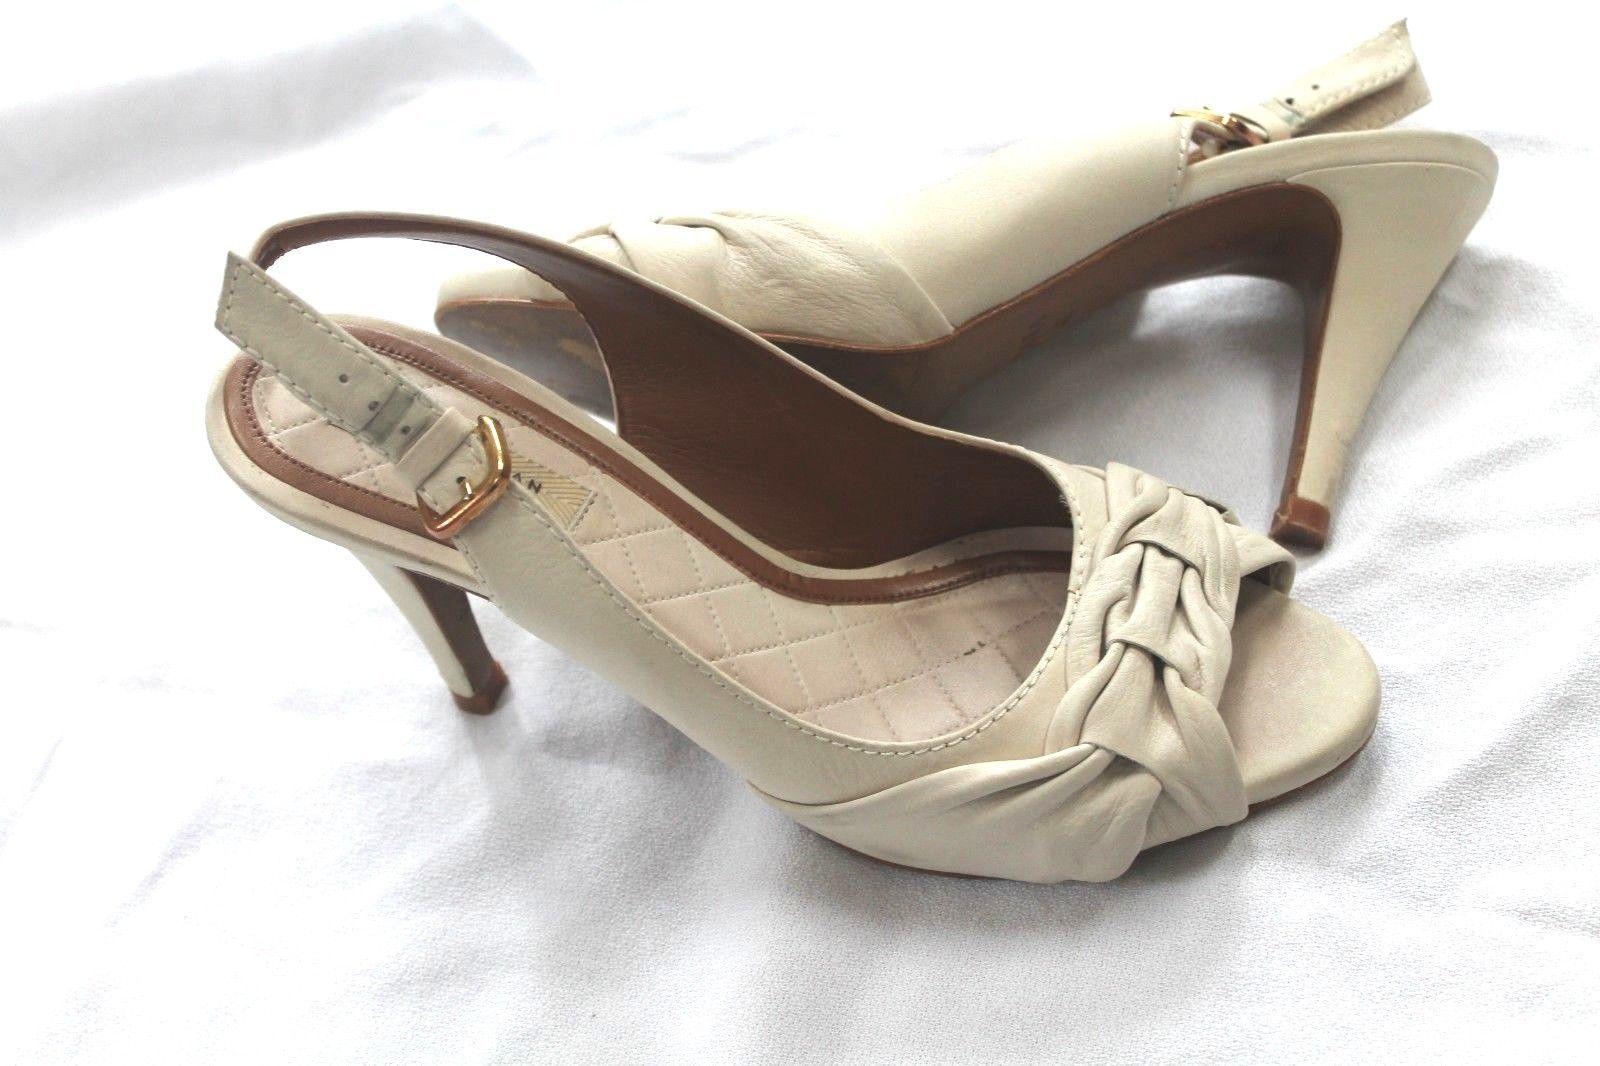 e457096a0c ZARA Ivory Open Toe Slingback SANDALS Shoes Size Eur 40 Us 9 - $38.61